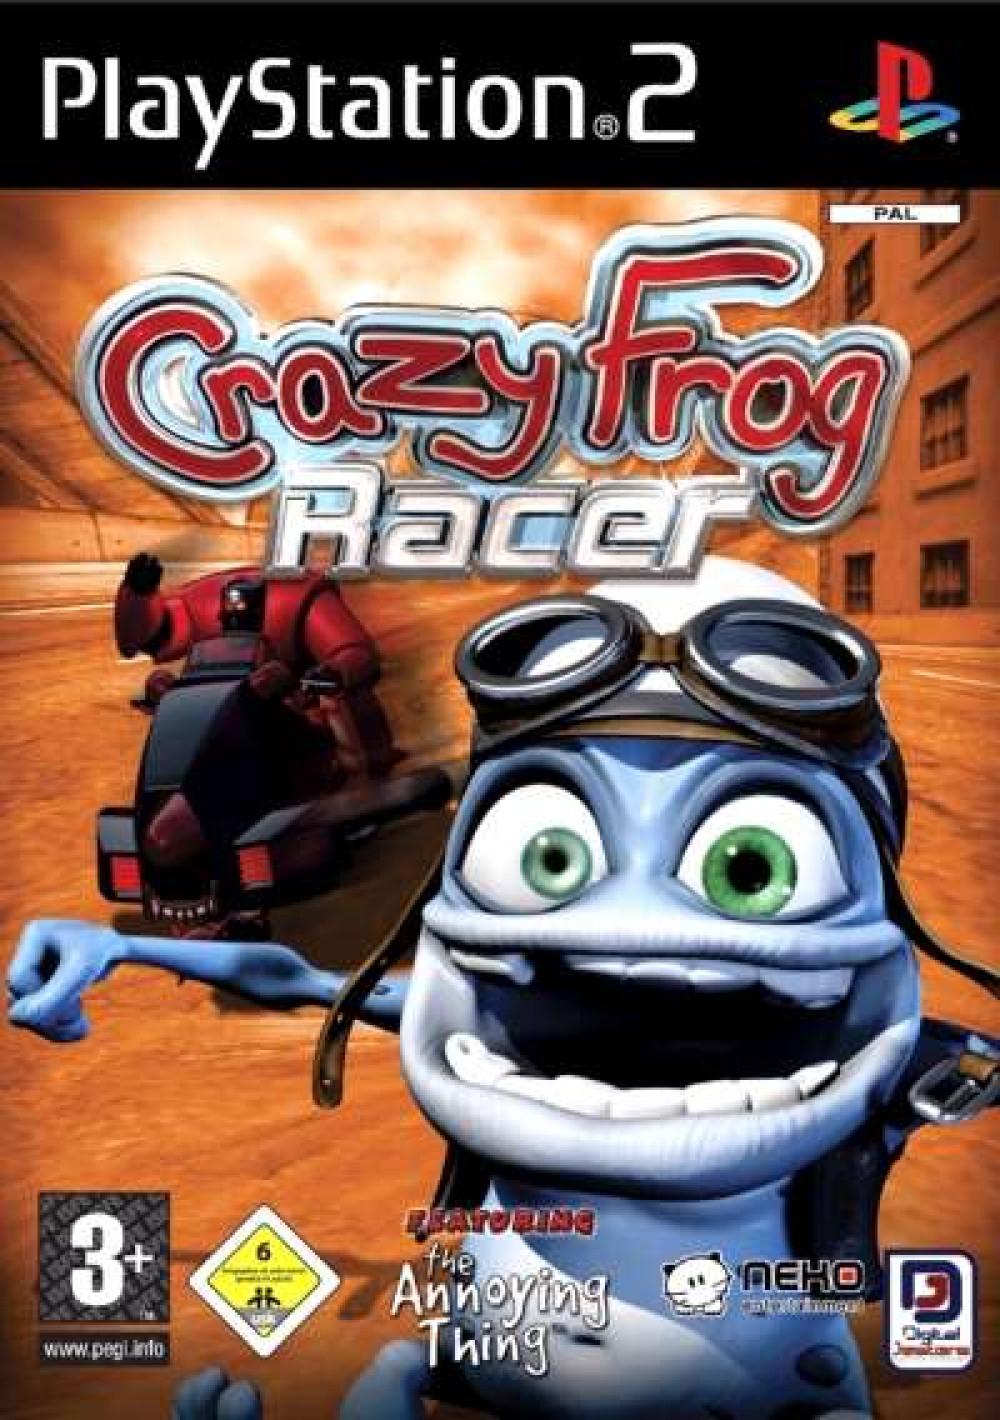 PS2 CRAZY FROG RACER